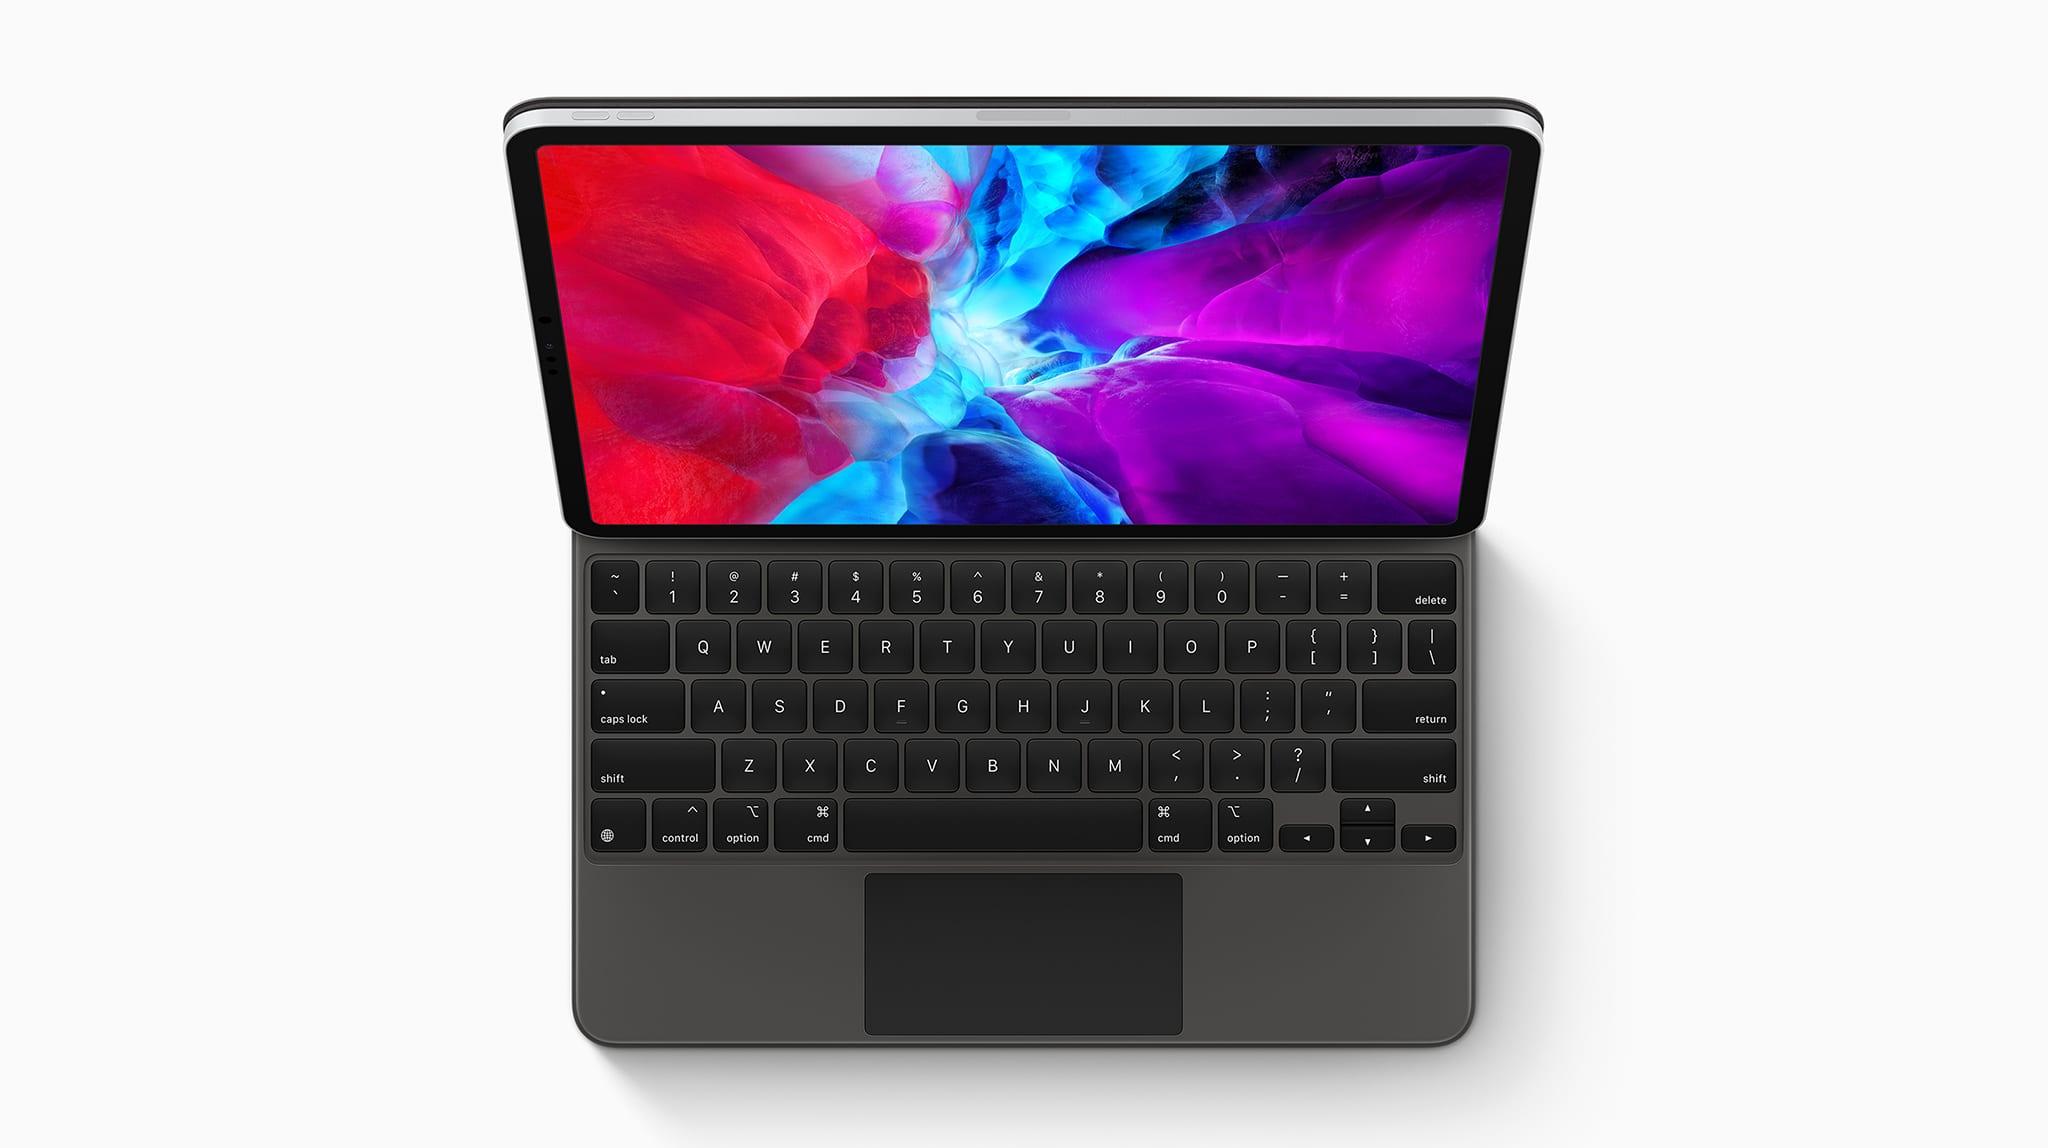 iPad Pro Magic Keyboard 2020 - Apple predstavil nový iPad Pro a Magic Keyboard s LED podsvietením - aktualizácia